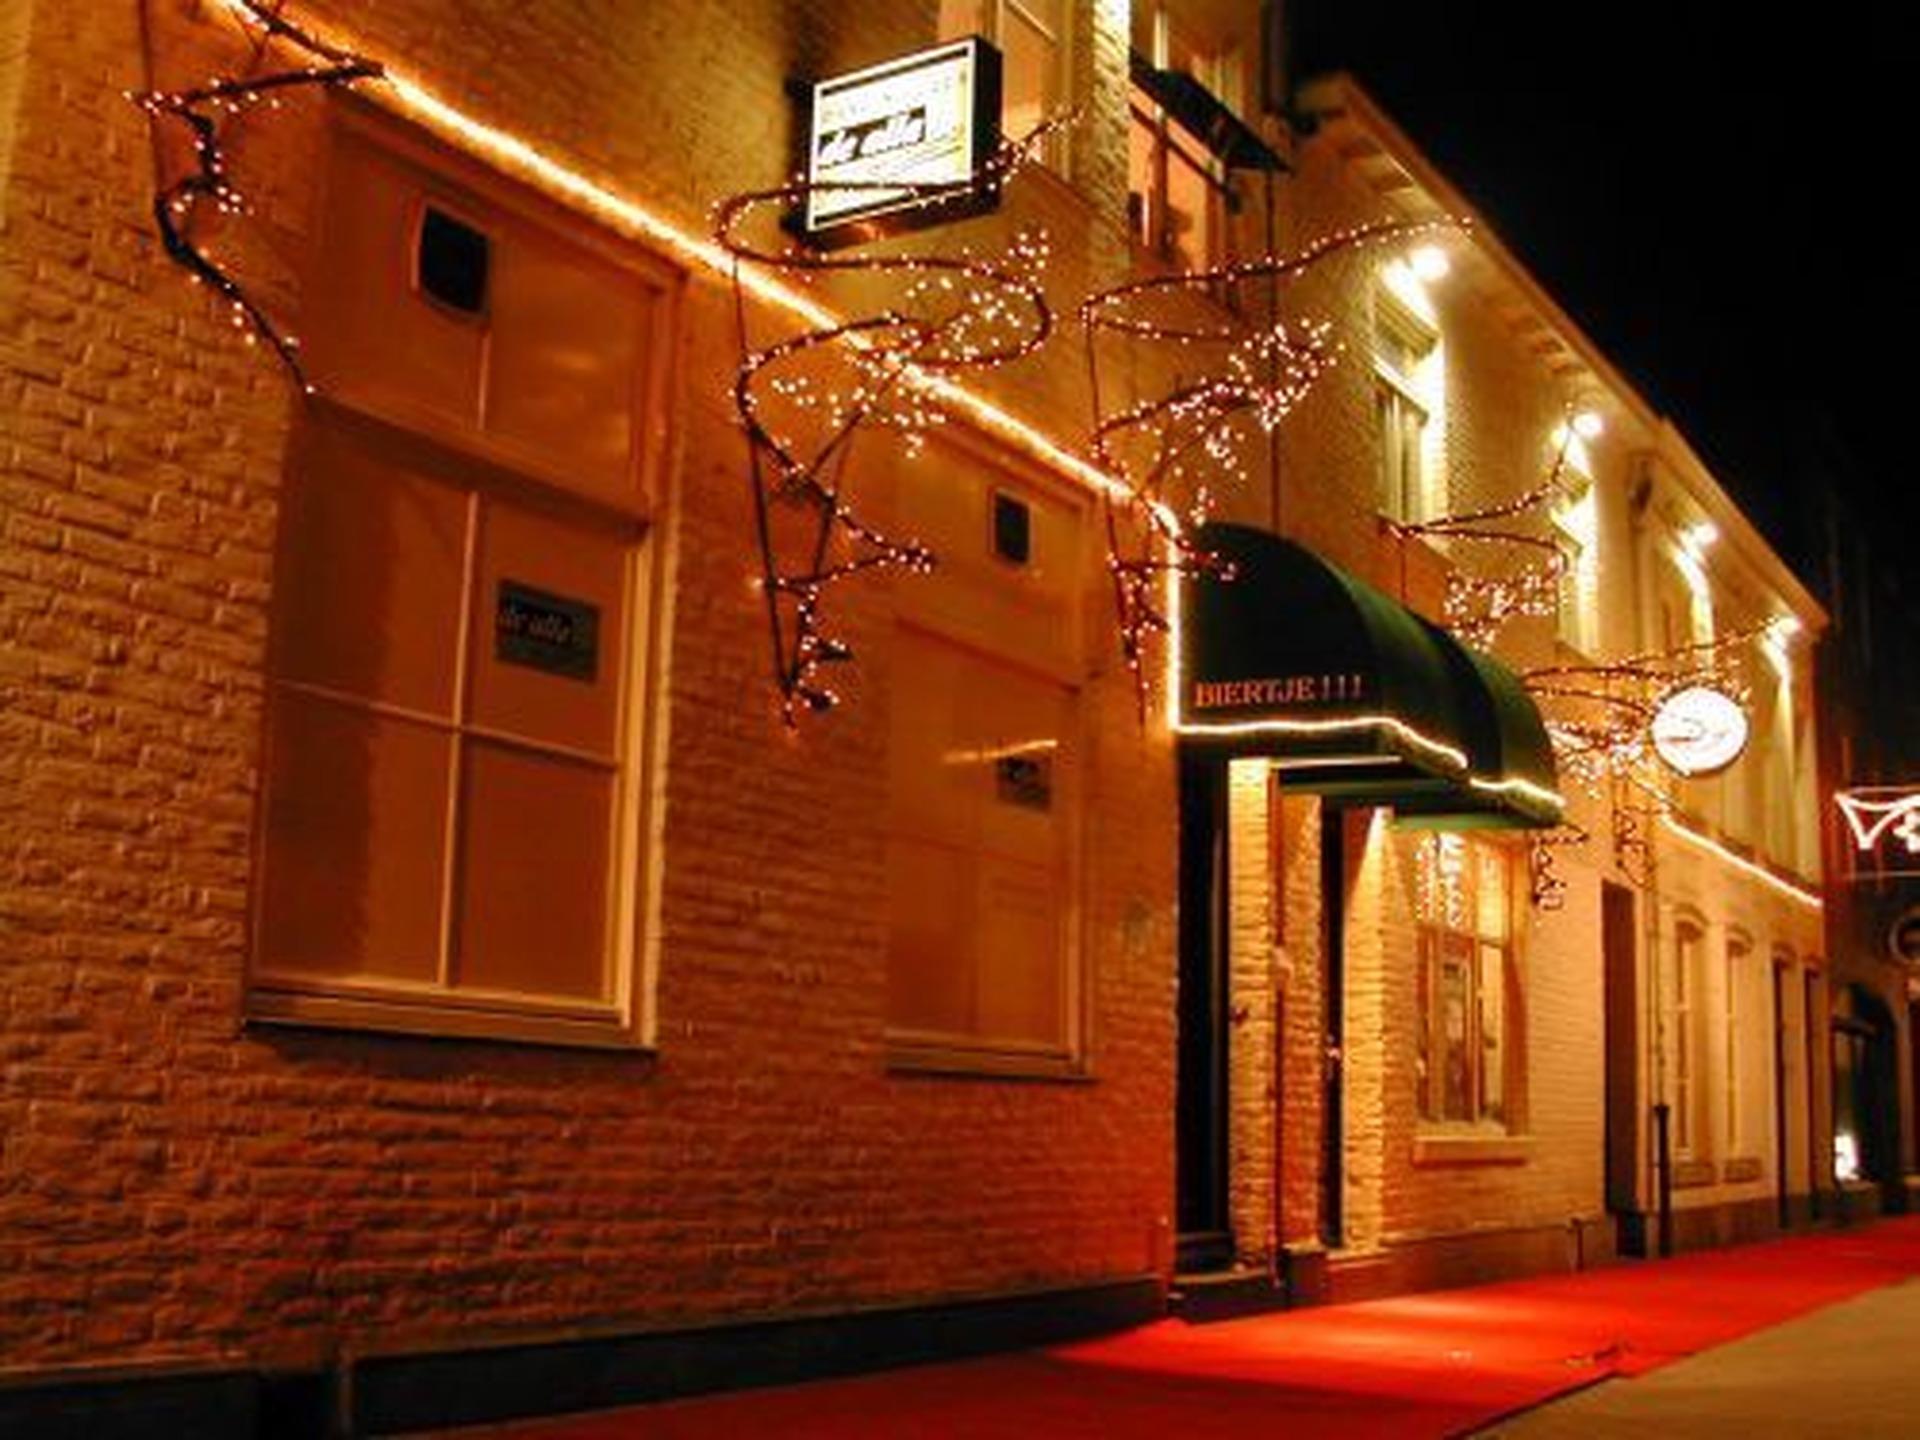 Rtv maastricht nachtclub de alla failliet verklaard - Nachtclub ...